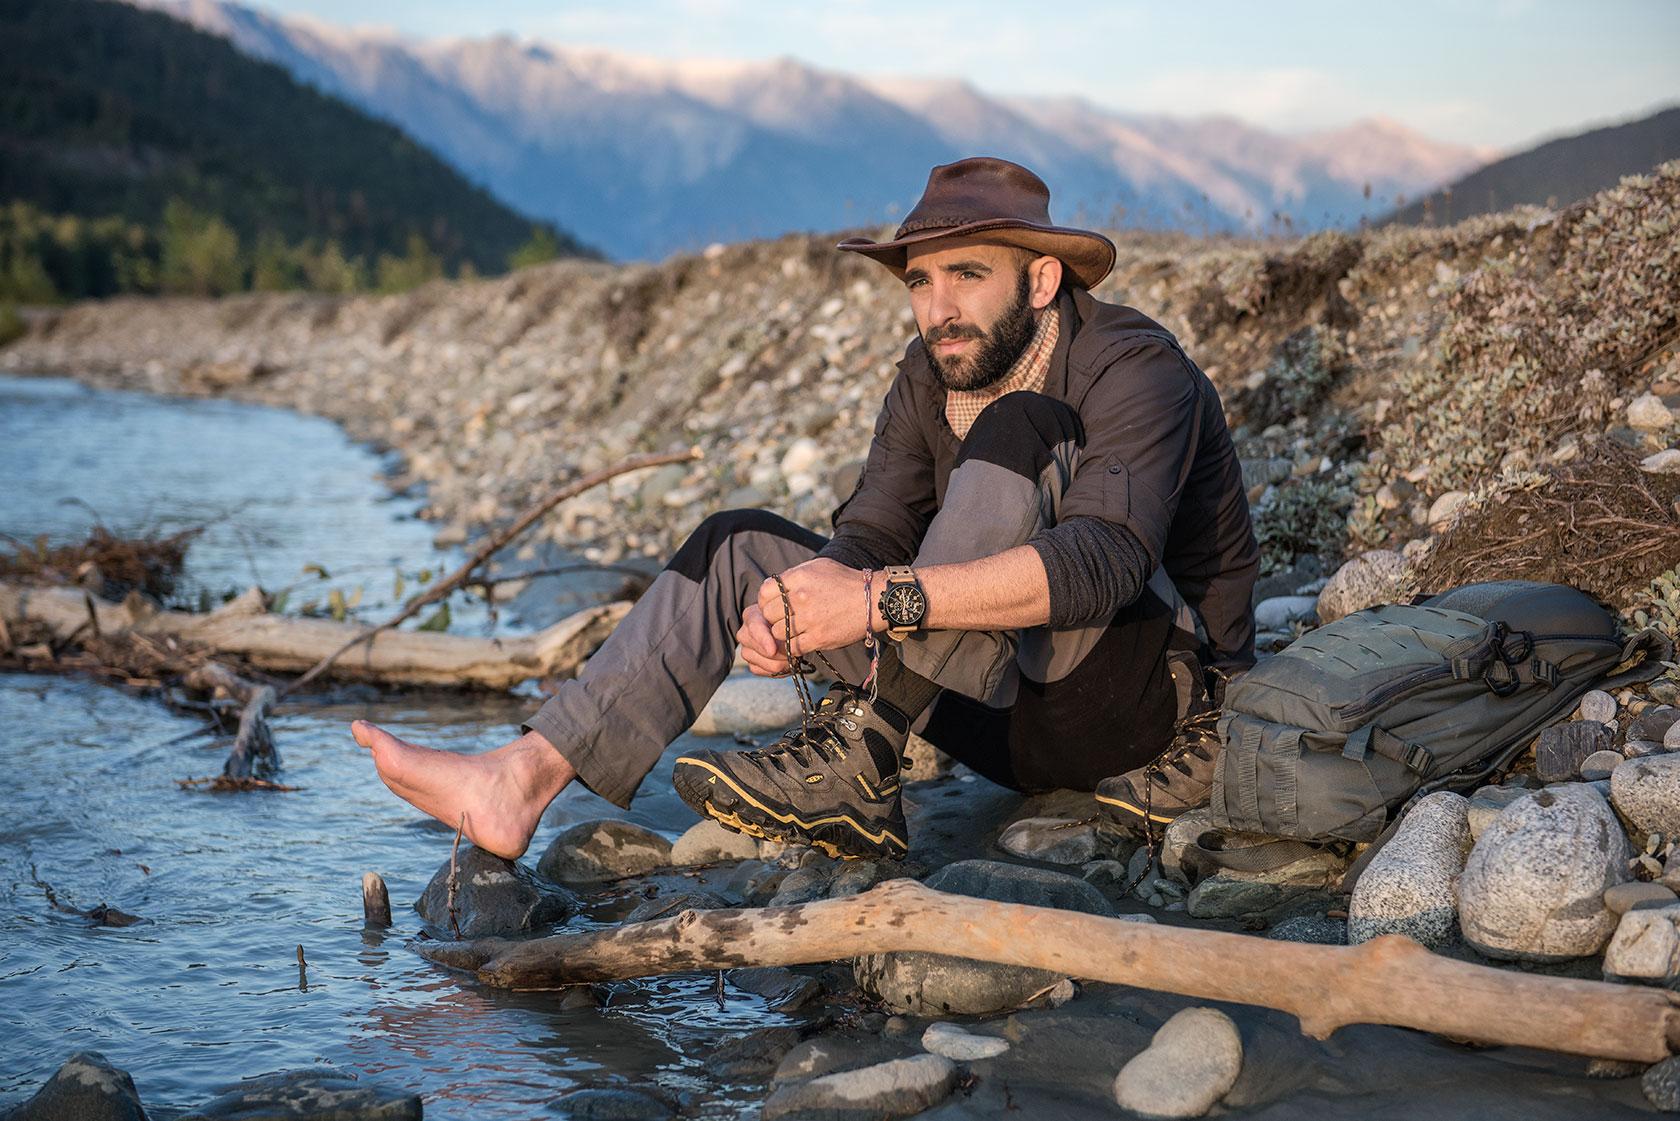 austin-trigg-brave-wilderness-alaska-BW-Coyote-Ties-keen-Boot-river.jpg